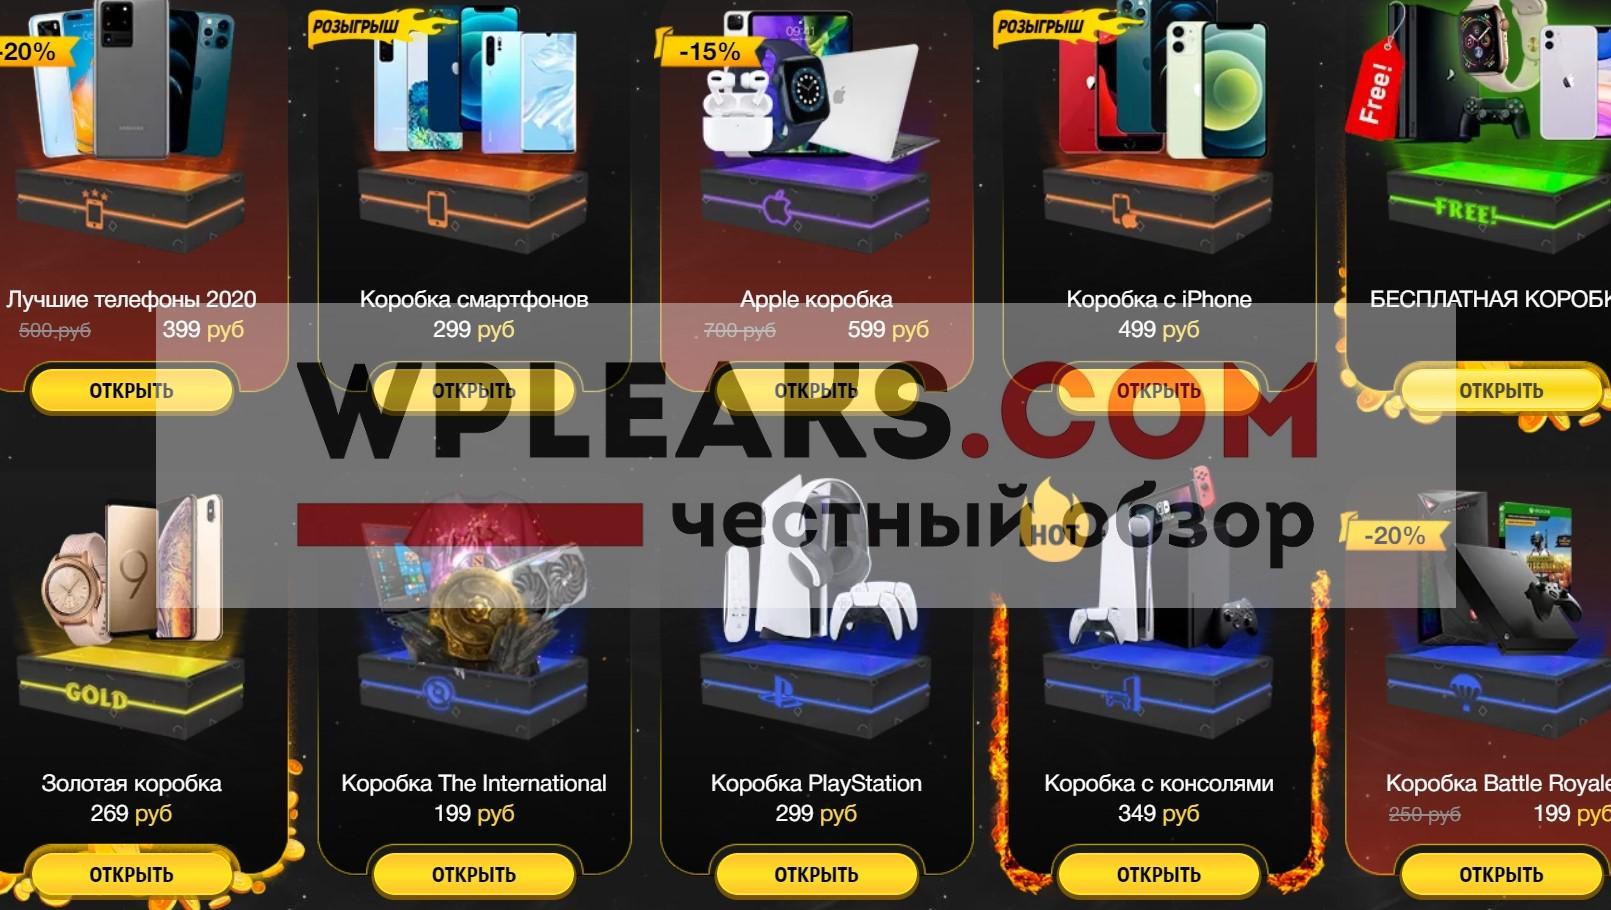 prizebox.org платит